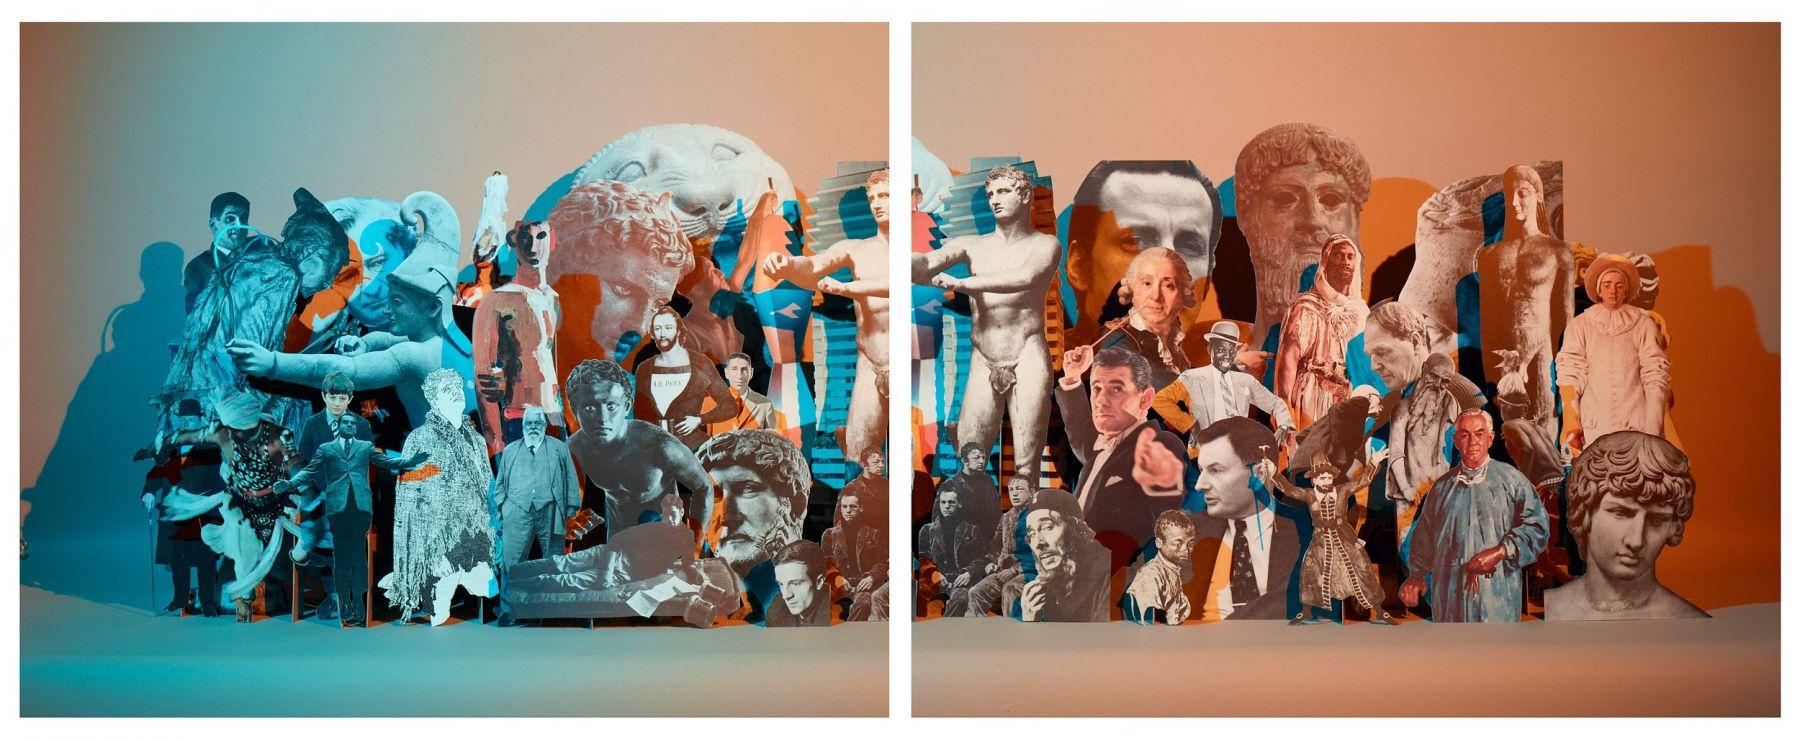 Untitled (Men), 2010